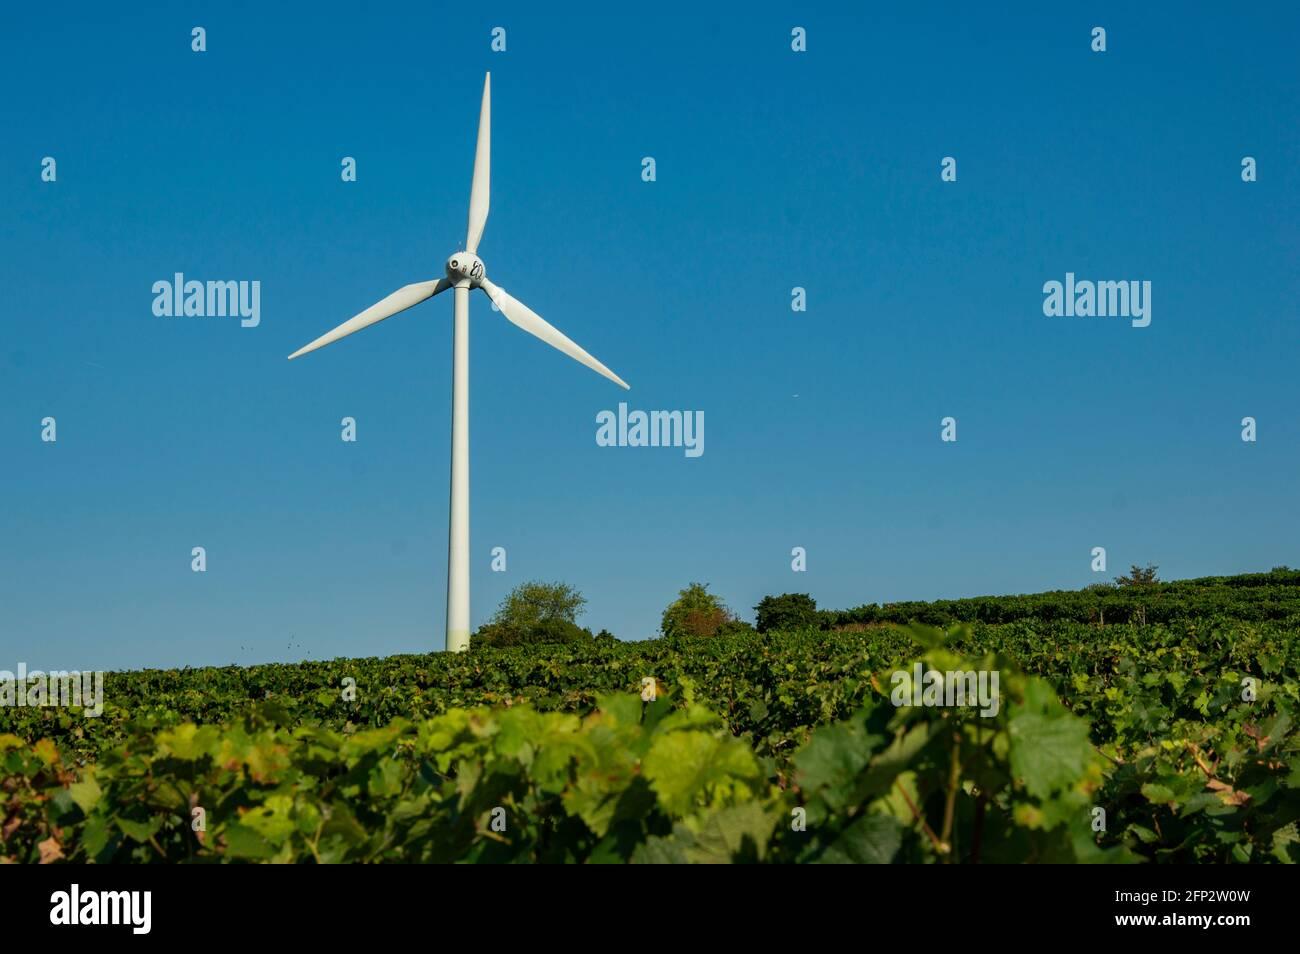 A Wind Turbine Between Vineyards Against A Blue Sky. The Wind Turbine Is In Rheinhessen Rhineland-Palatinate Near The Village Of Eimsheim. Stock Photo